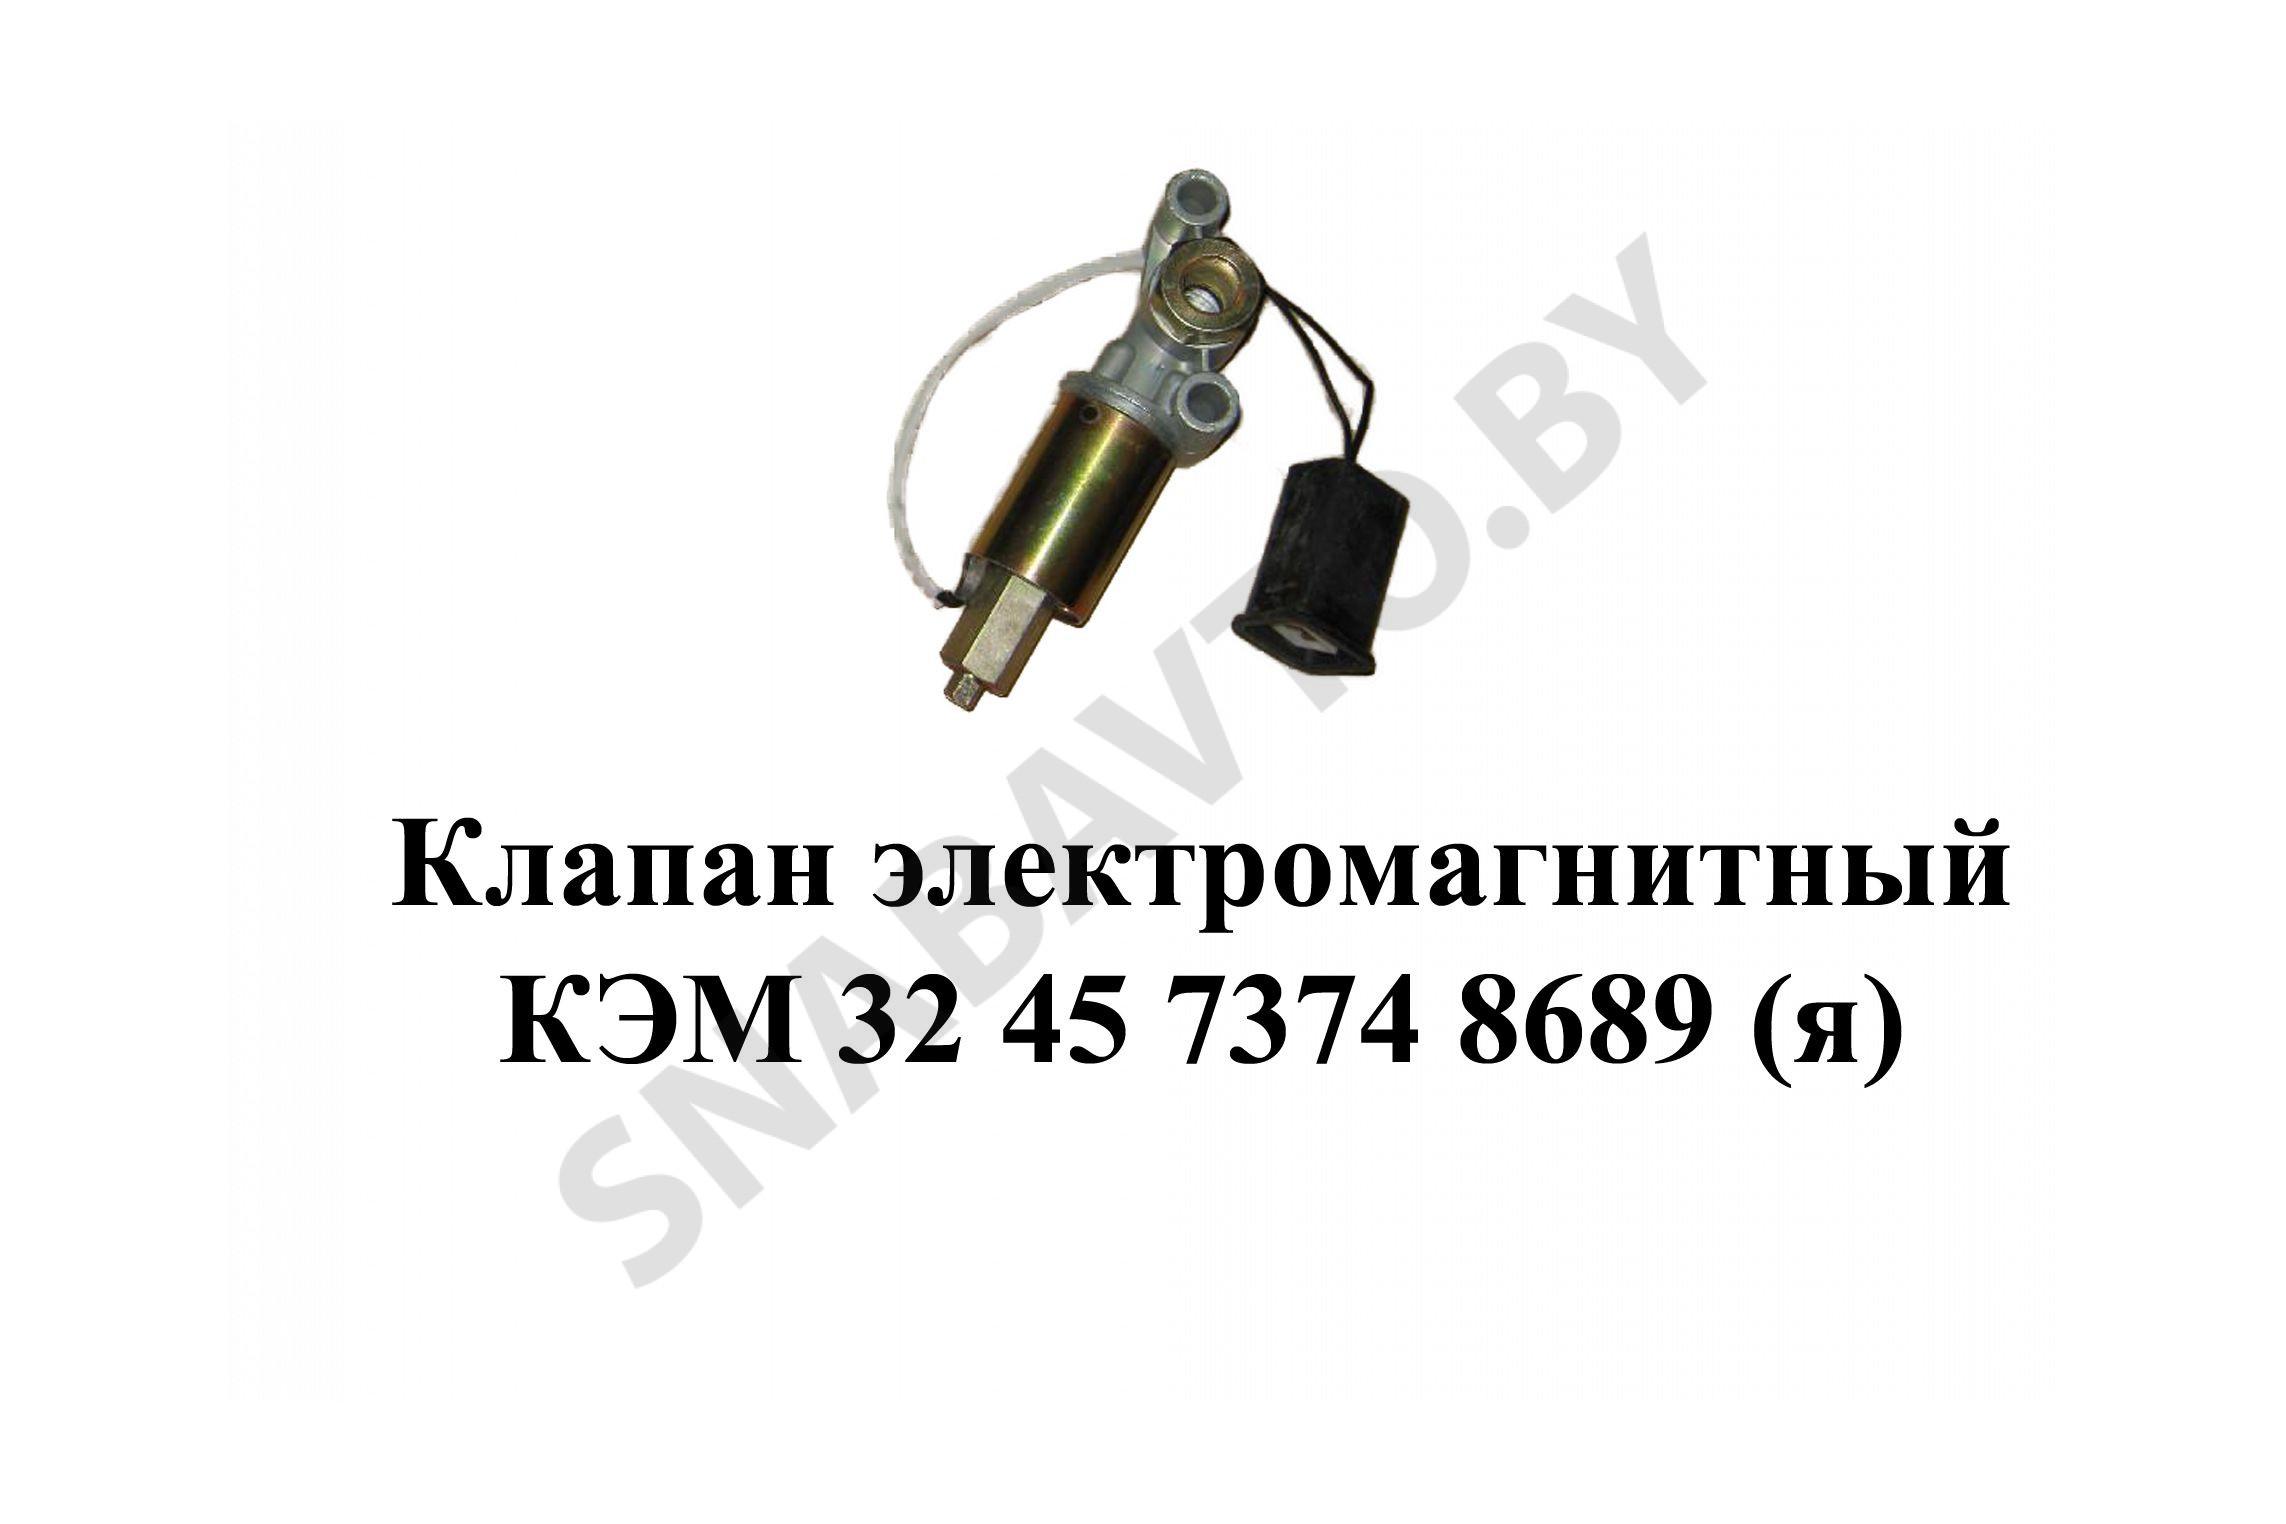 45 7374 8689 (КЭМ 32-23)